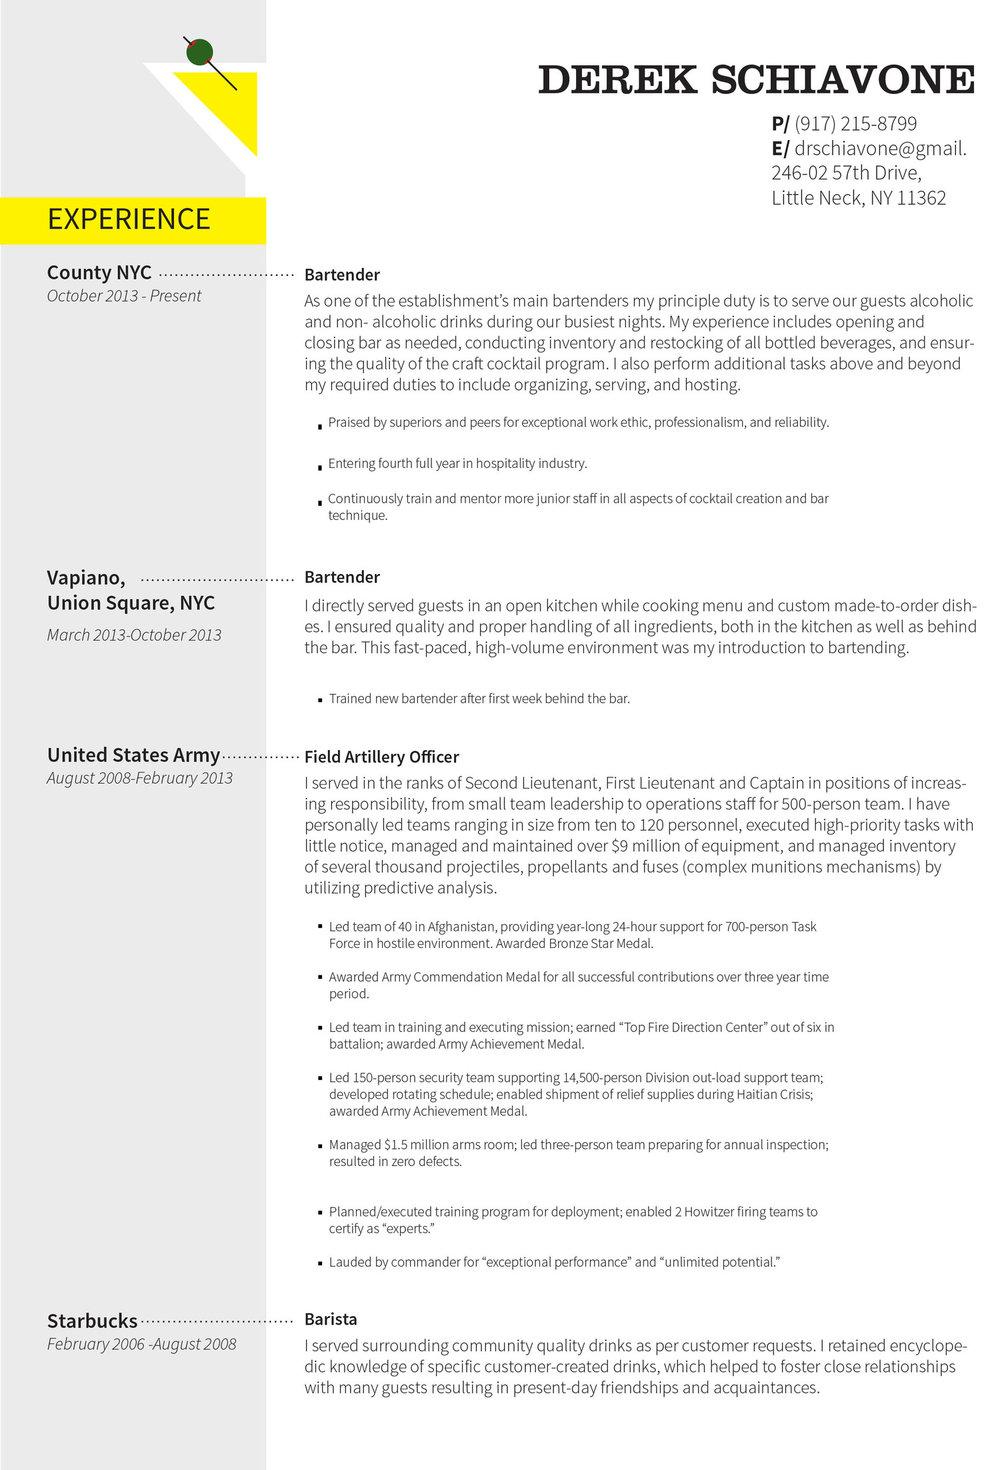 resume templates holly burt